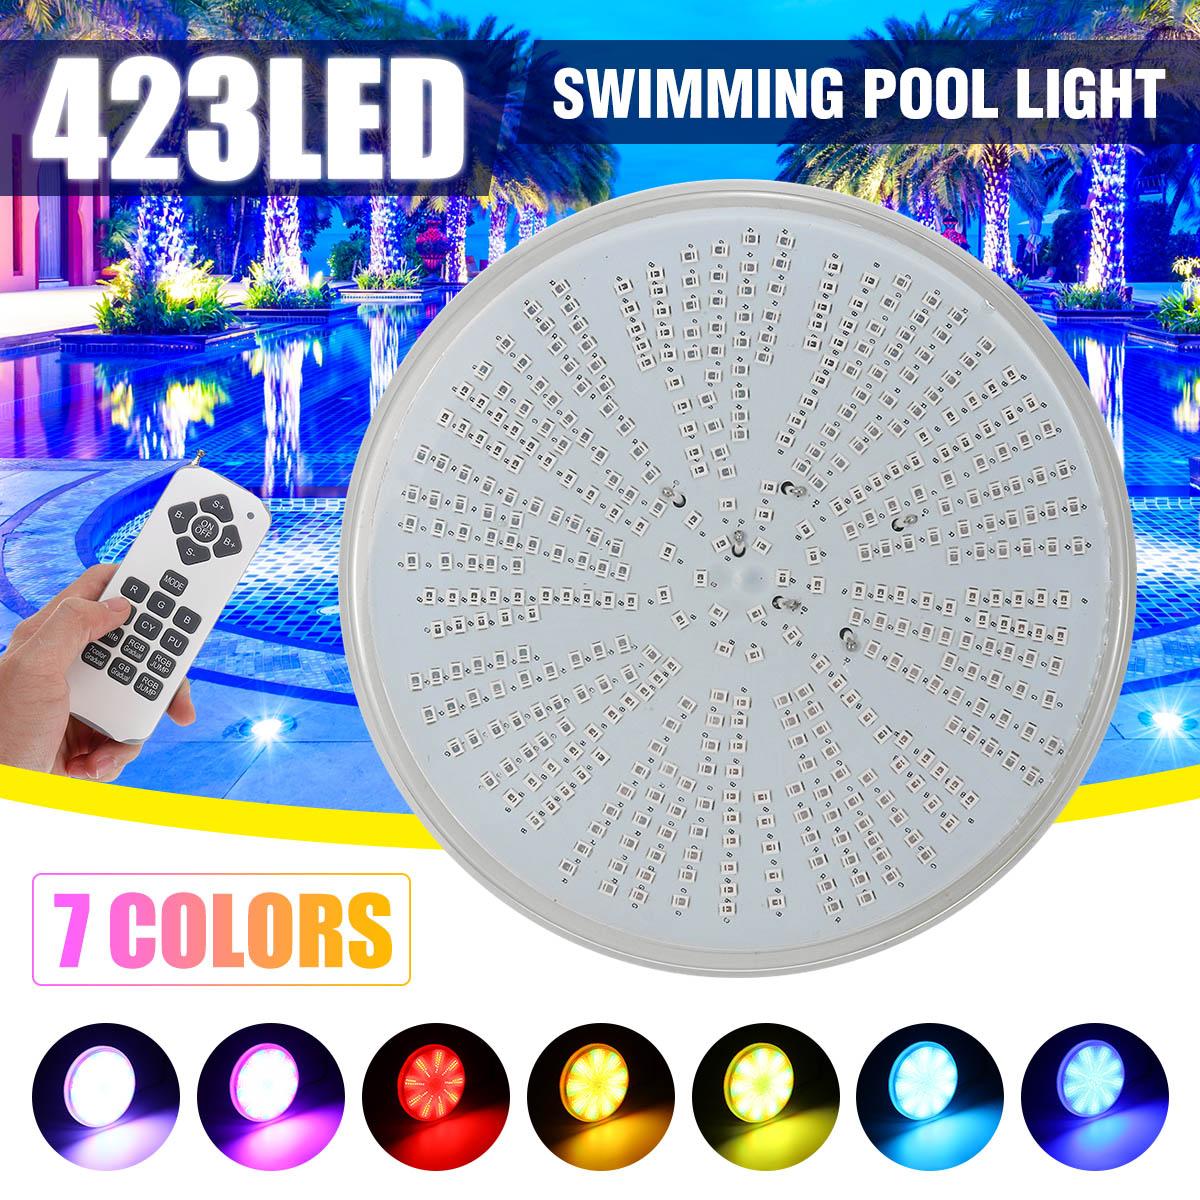 Led Zwembad Licht 423leds AC/DC12V RGB Hars Vervanging PAR56 Lamp Waterdicht IP68 Multi Kleur 2m draad Onderwater Verlichting